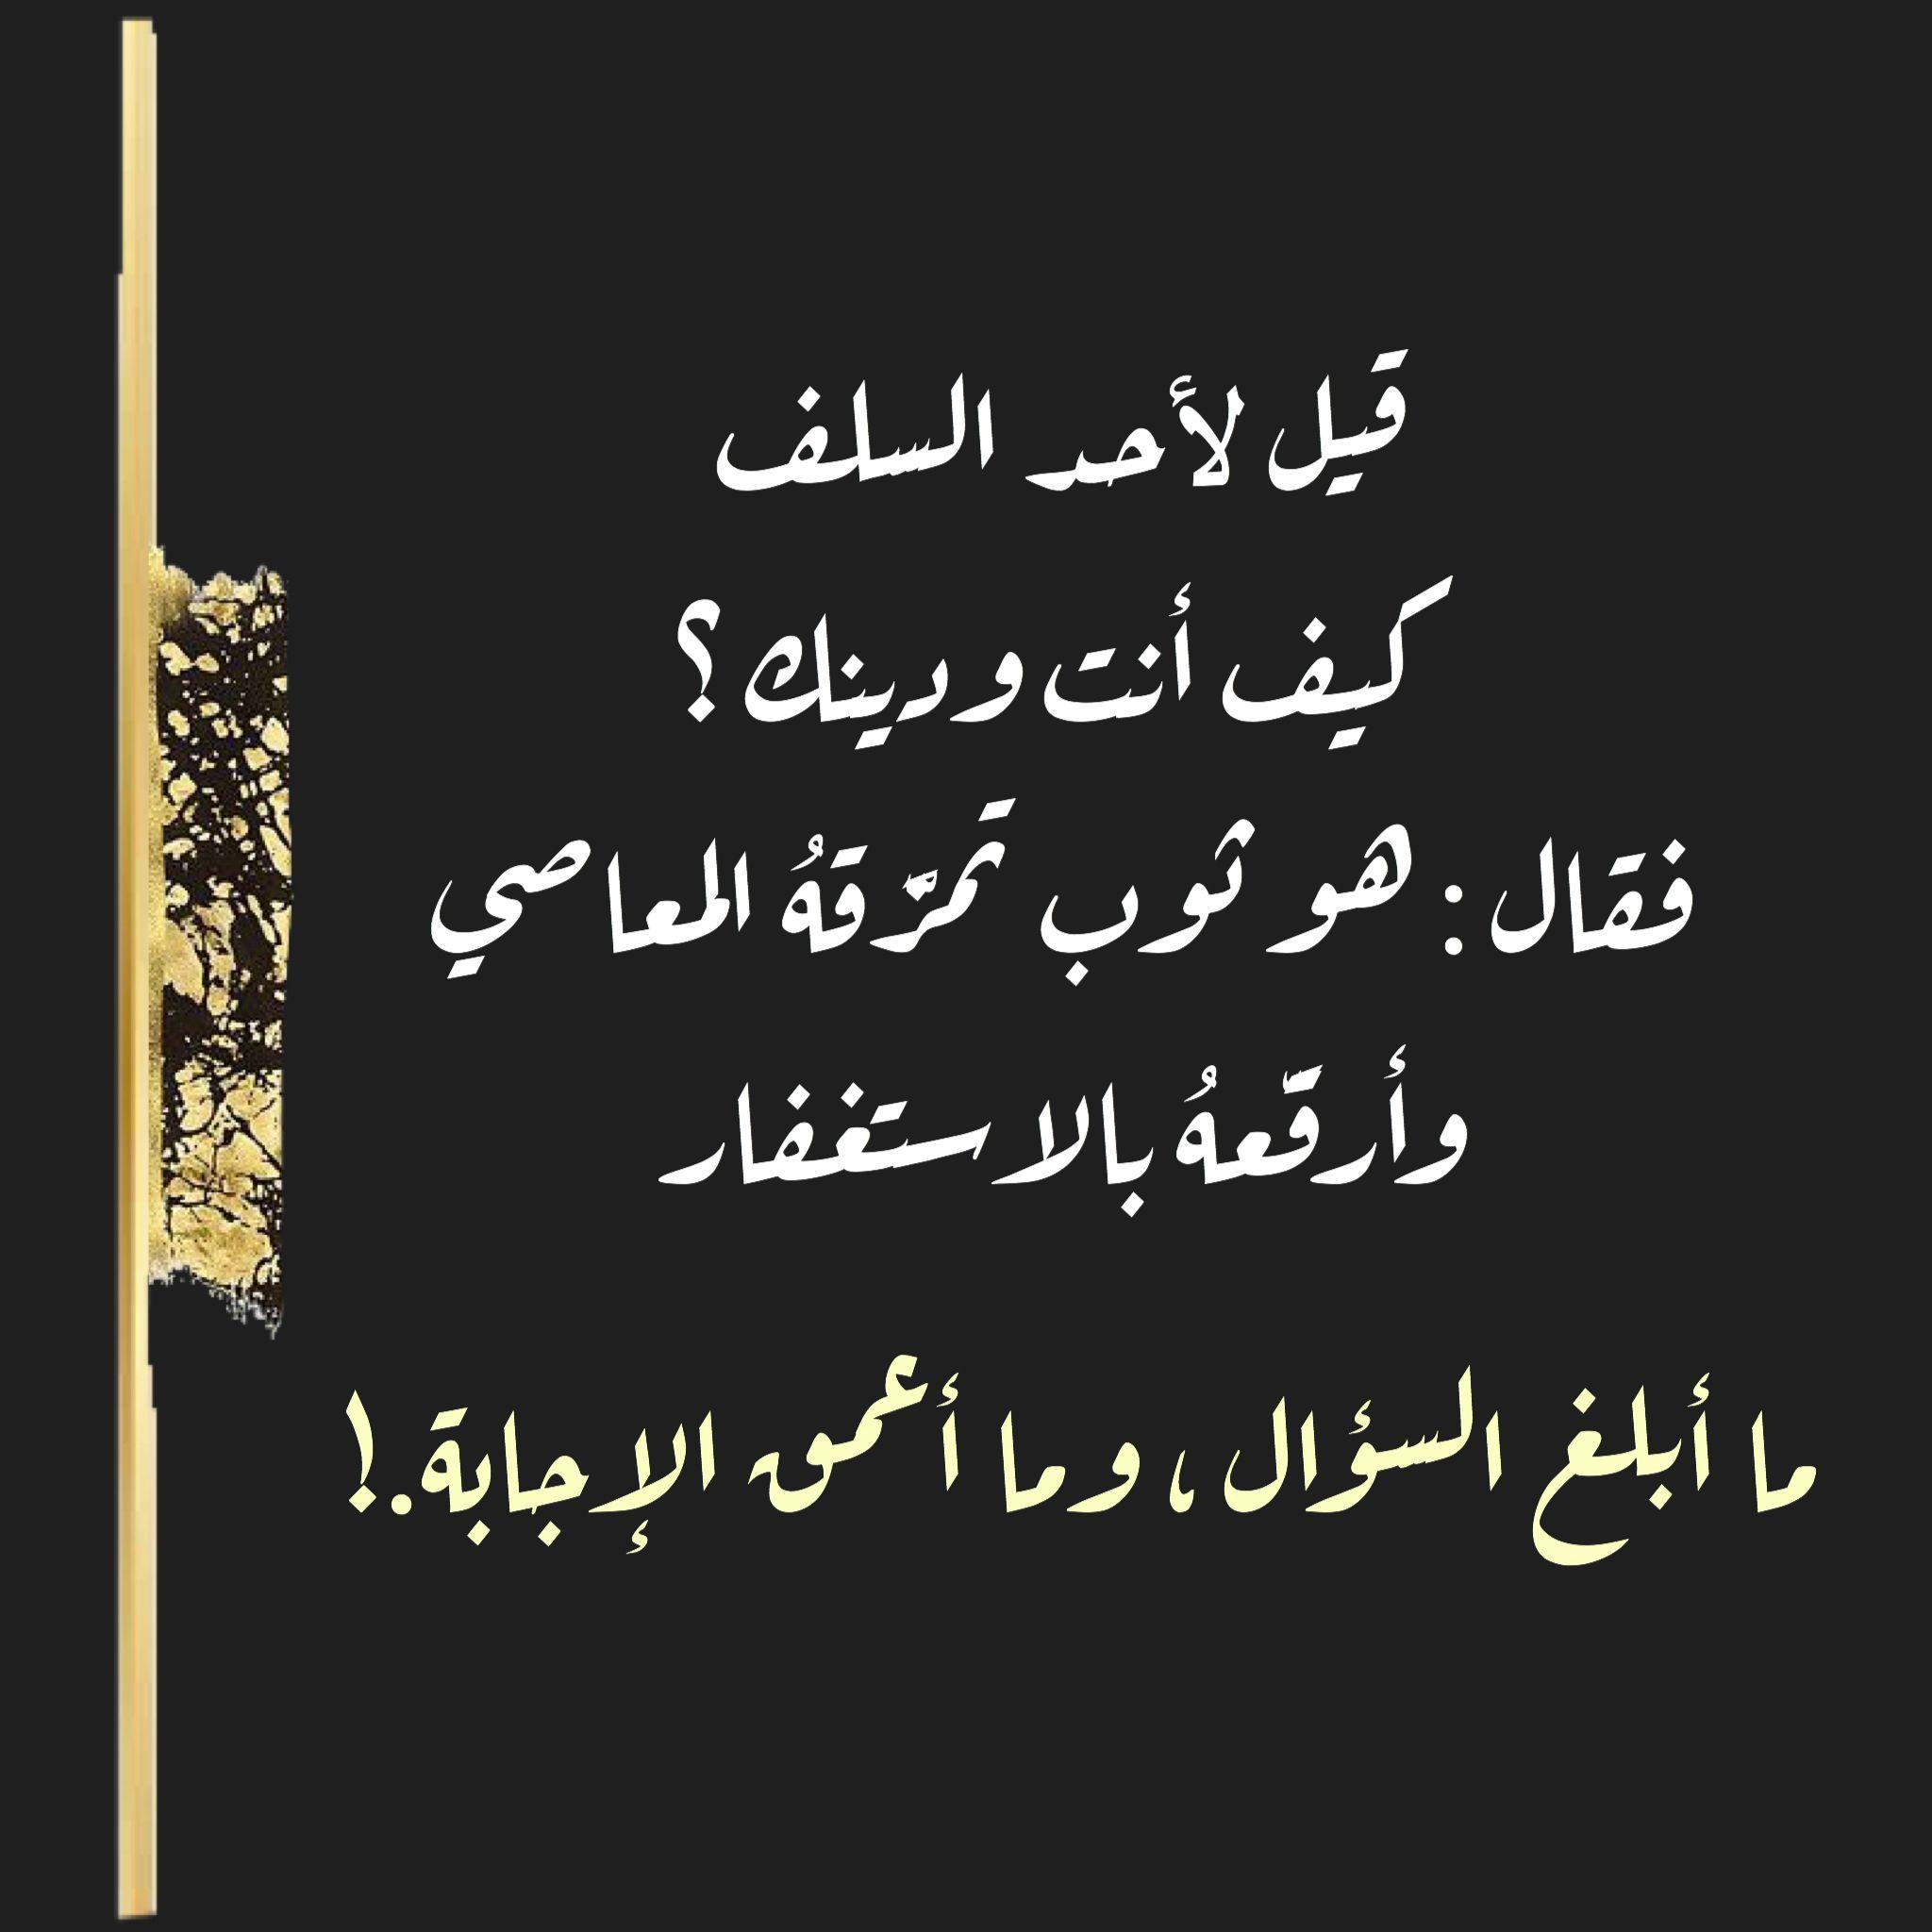 استغفرالله Islamic Inspirational Quotes Inspirational Quotes Quotes